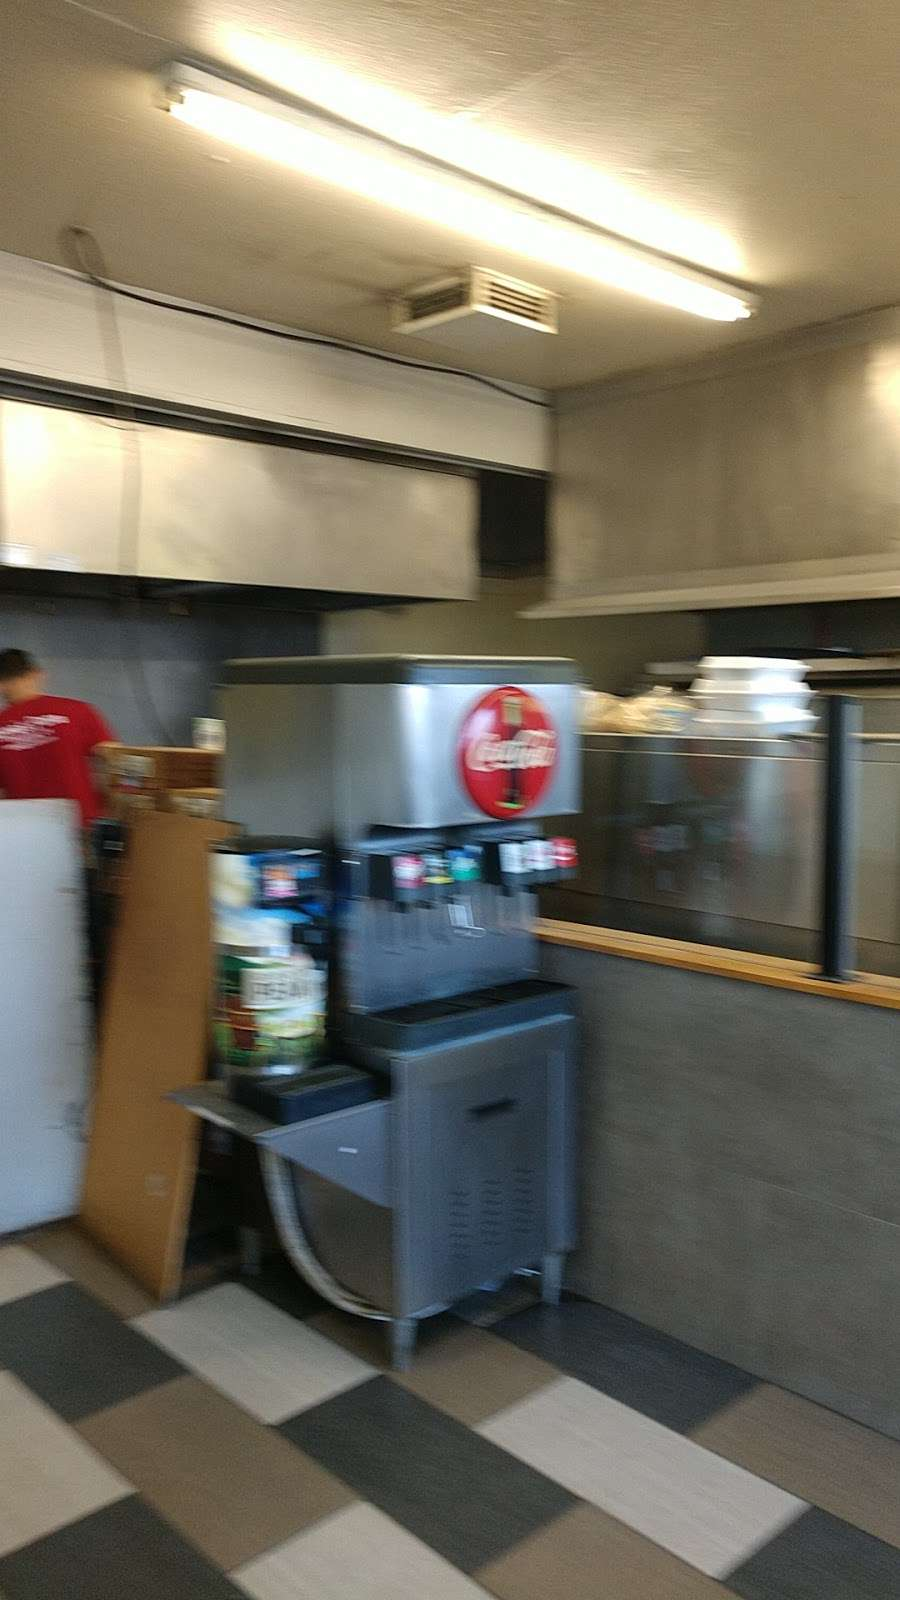 Romas Pizza - restaurant    Photo 5 of 10   Address: 617 N Redondo Dr # B, Oceanside, CA 92057, USA   Phone: (760) 757-2003